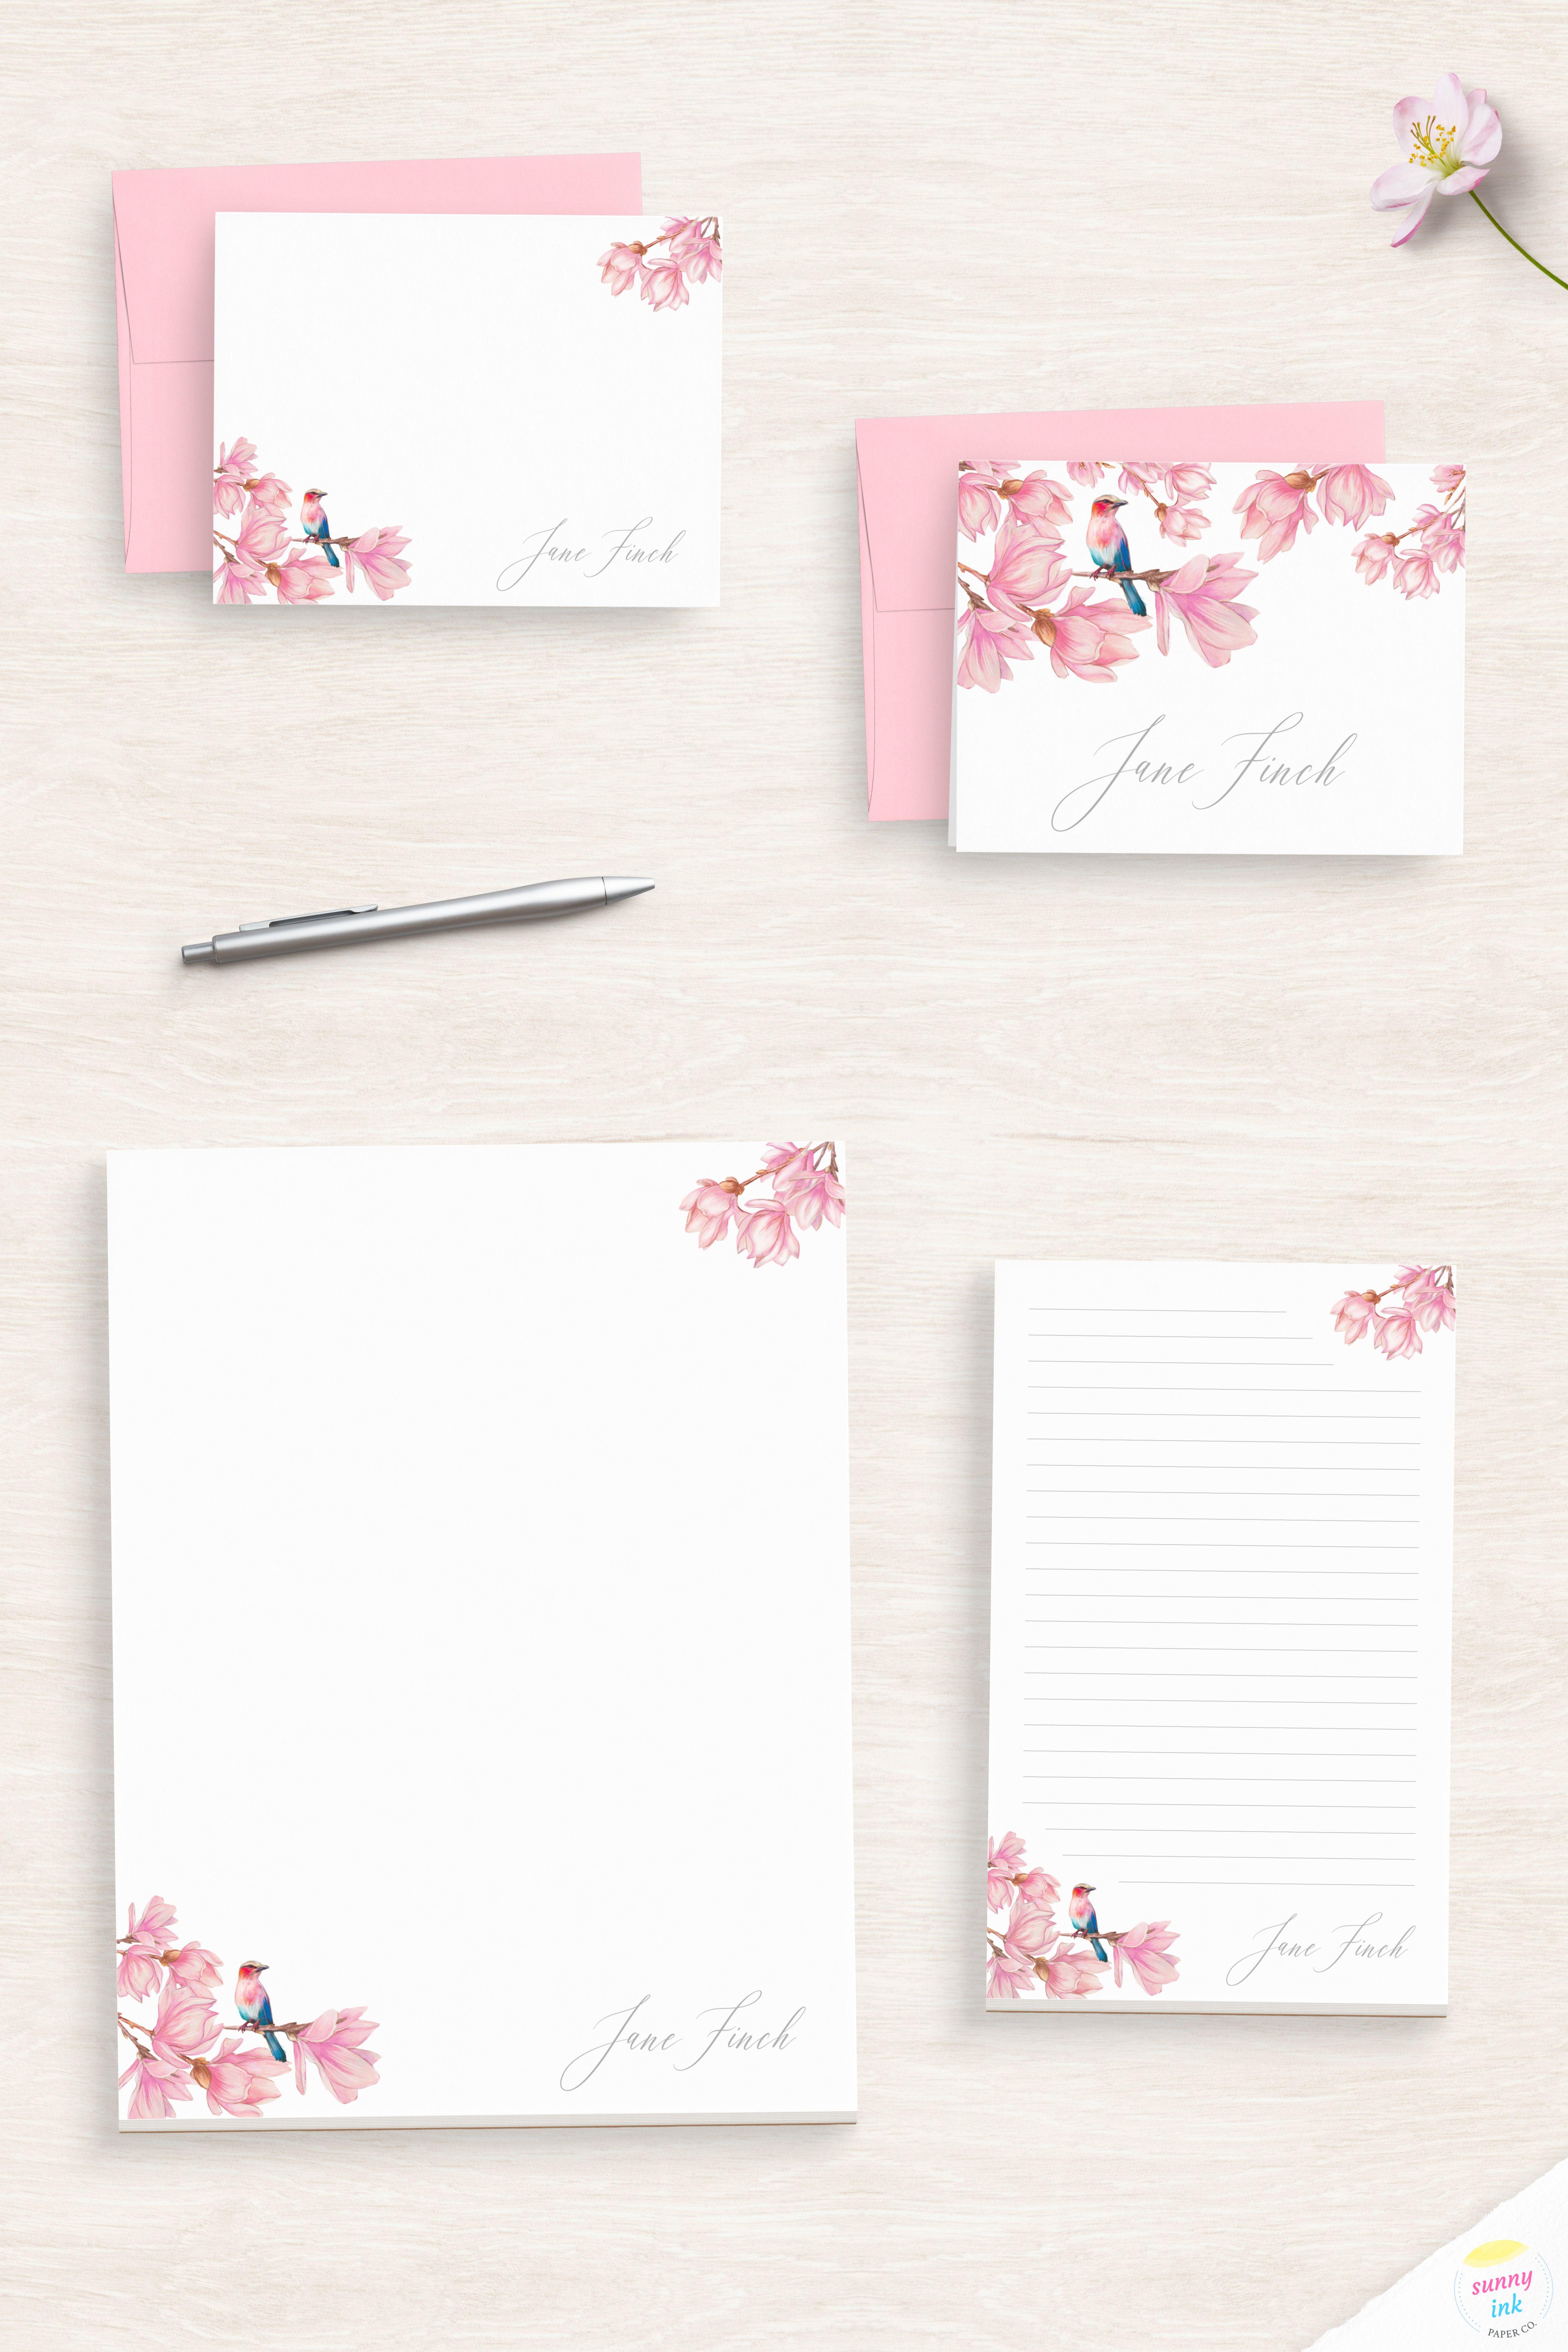 Personalized Stationery Set Custom Stationery Stationery Set Flamingo Personalized Stationery